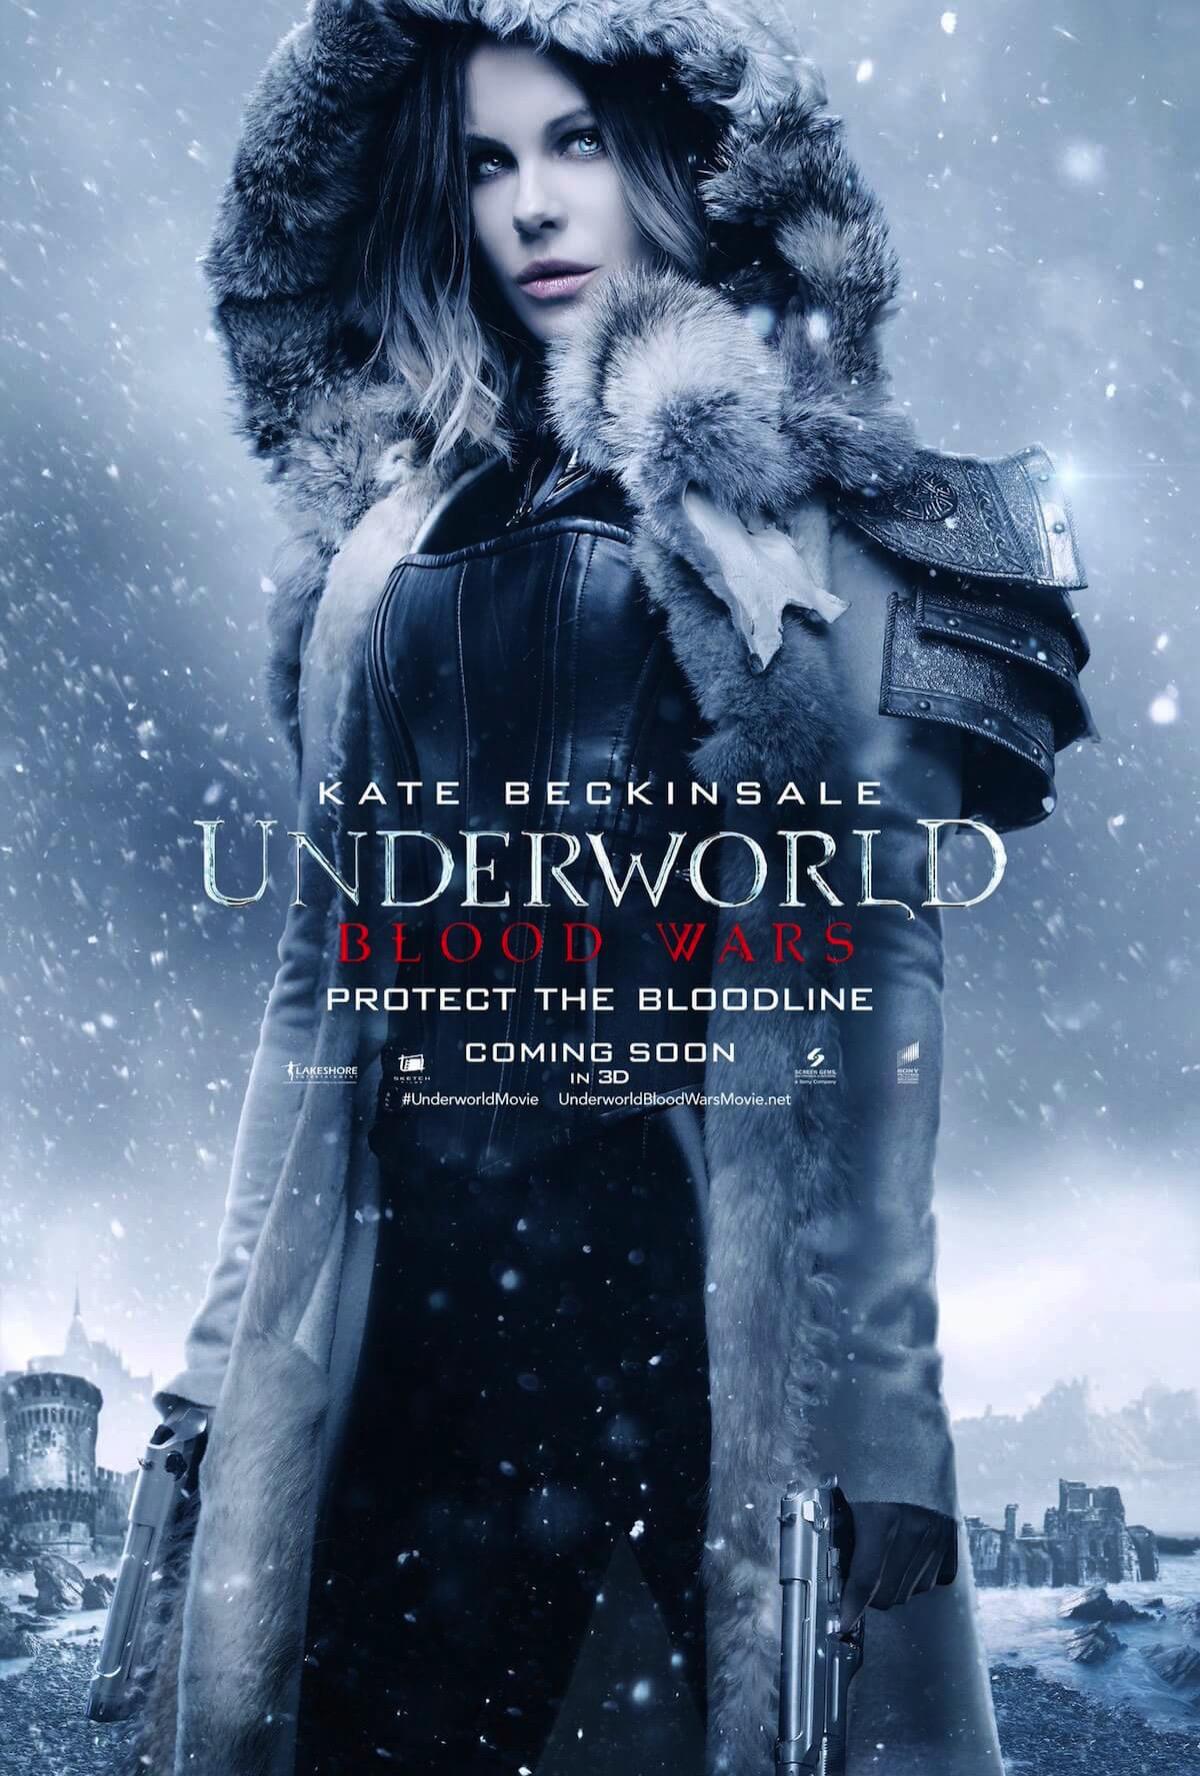 underworld-5-blood-wars-poster-kate-beckinsale.jpg